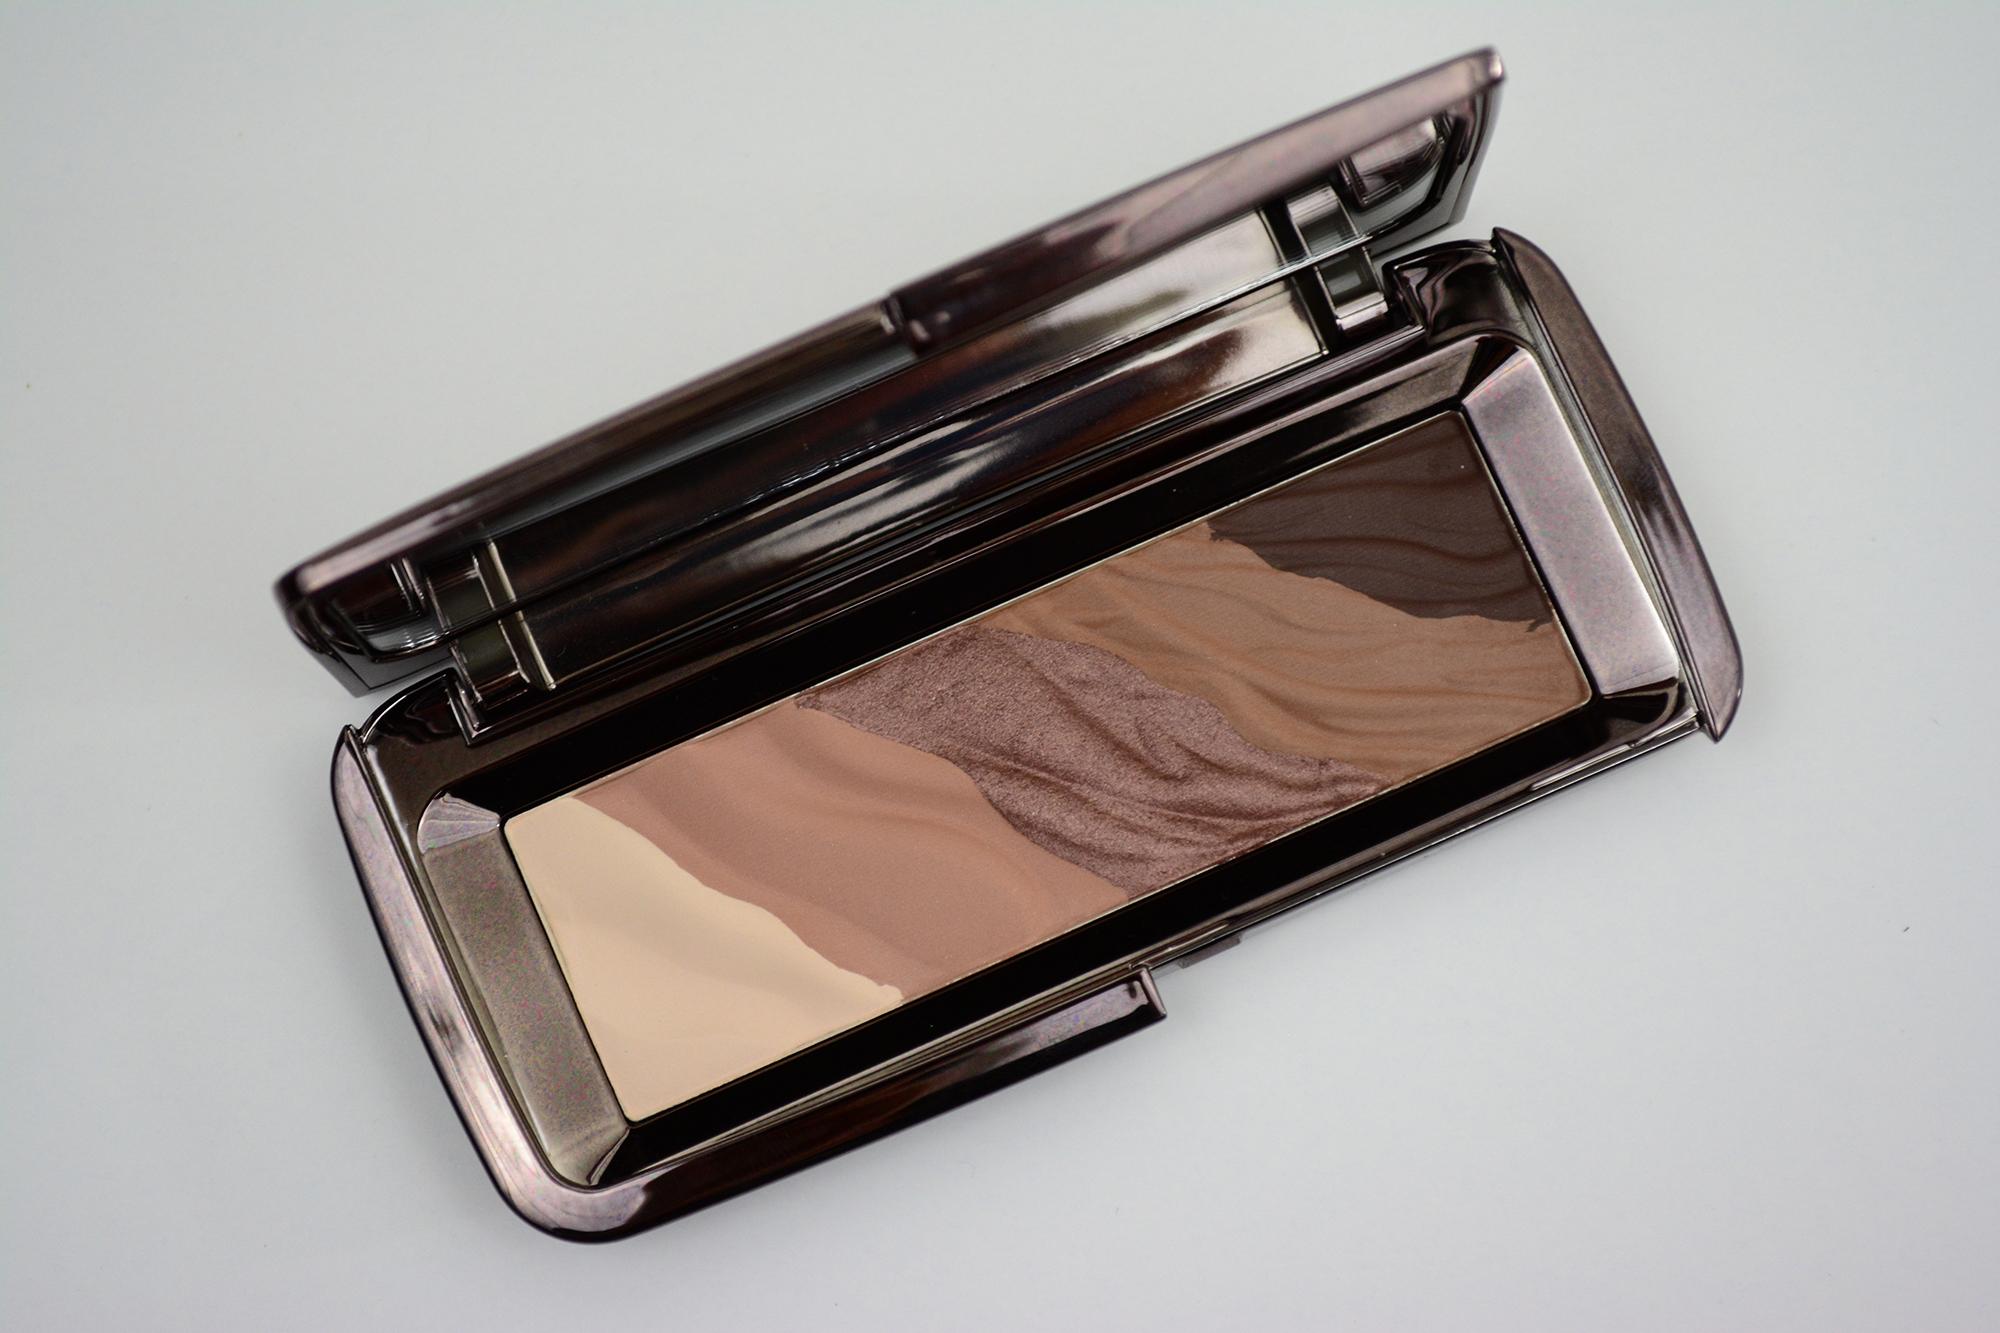 New Stuff: Hourglass Modernist Eyeshadow Palette